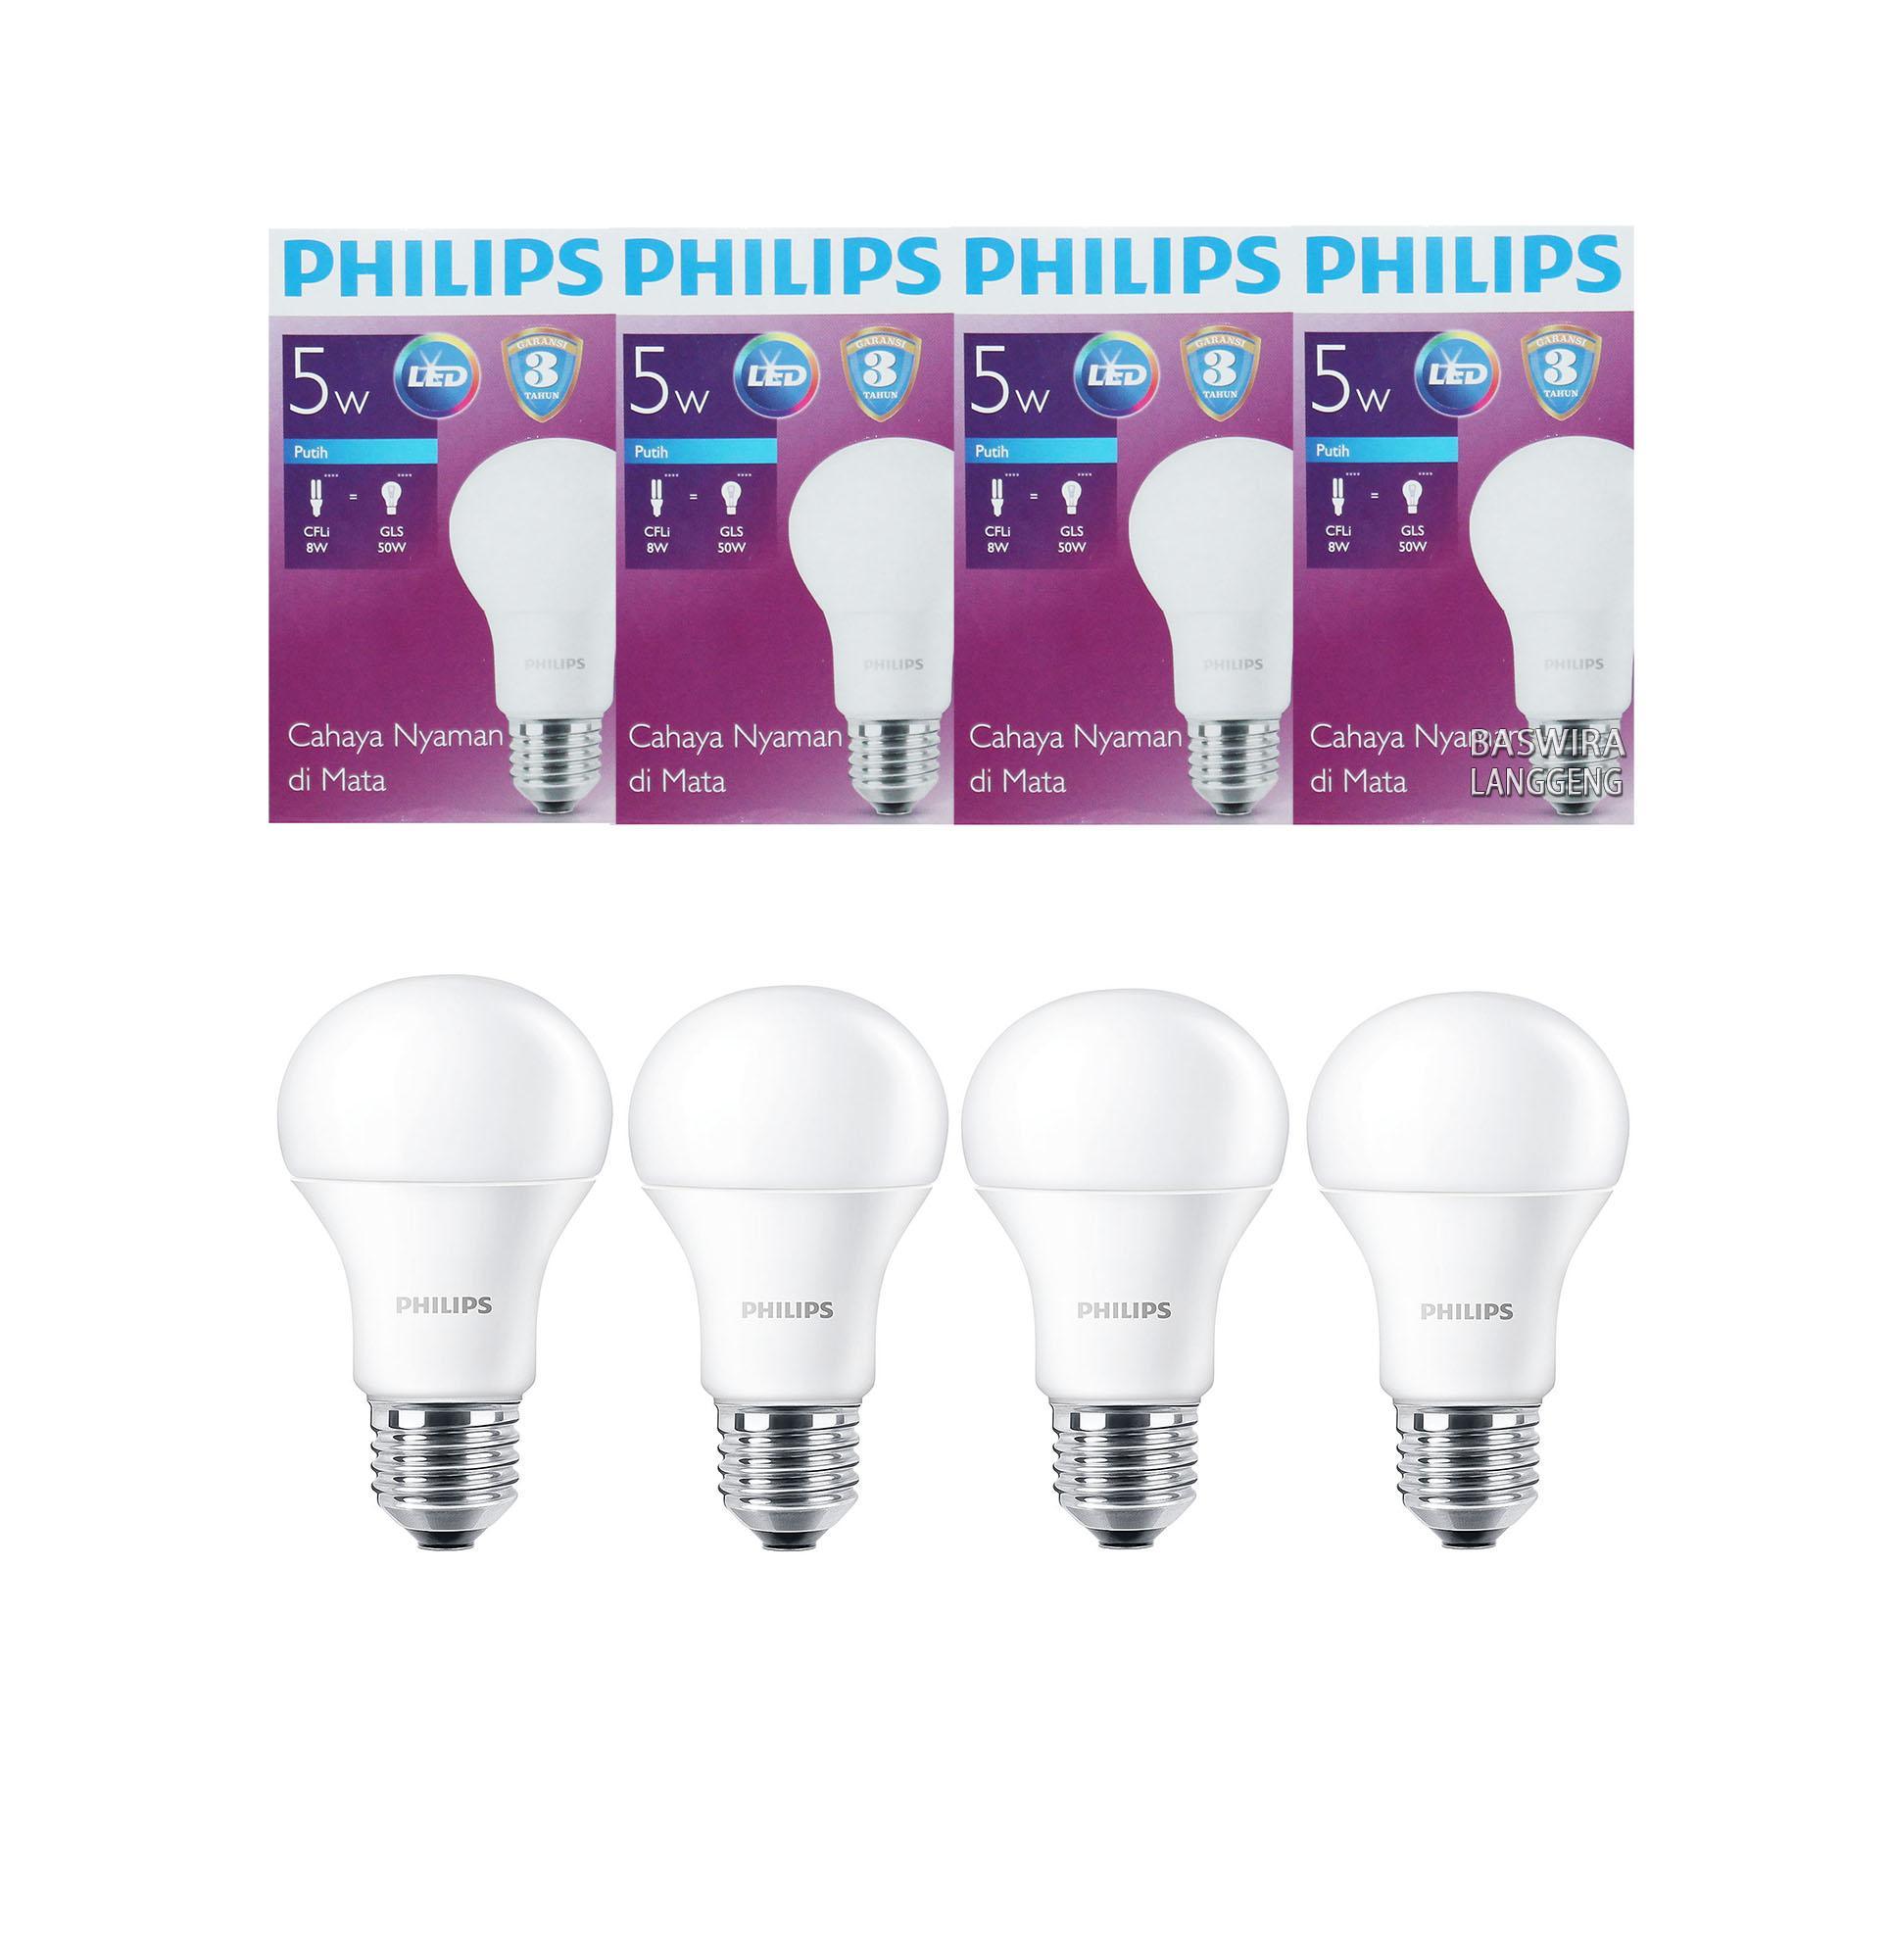 Jual Lampu Bohlam Philips Led Bulb 13 Watt 6500k Paket 3 Gratis 1 5 Wat W 5watt 5w 4 Pcs Putih